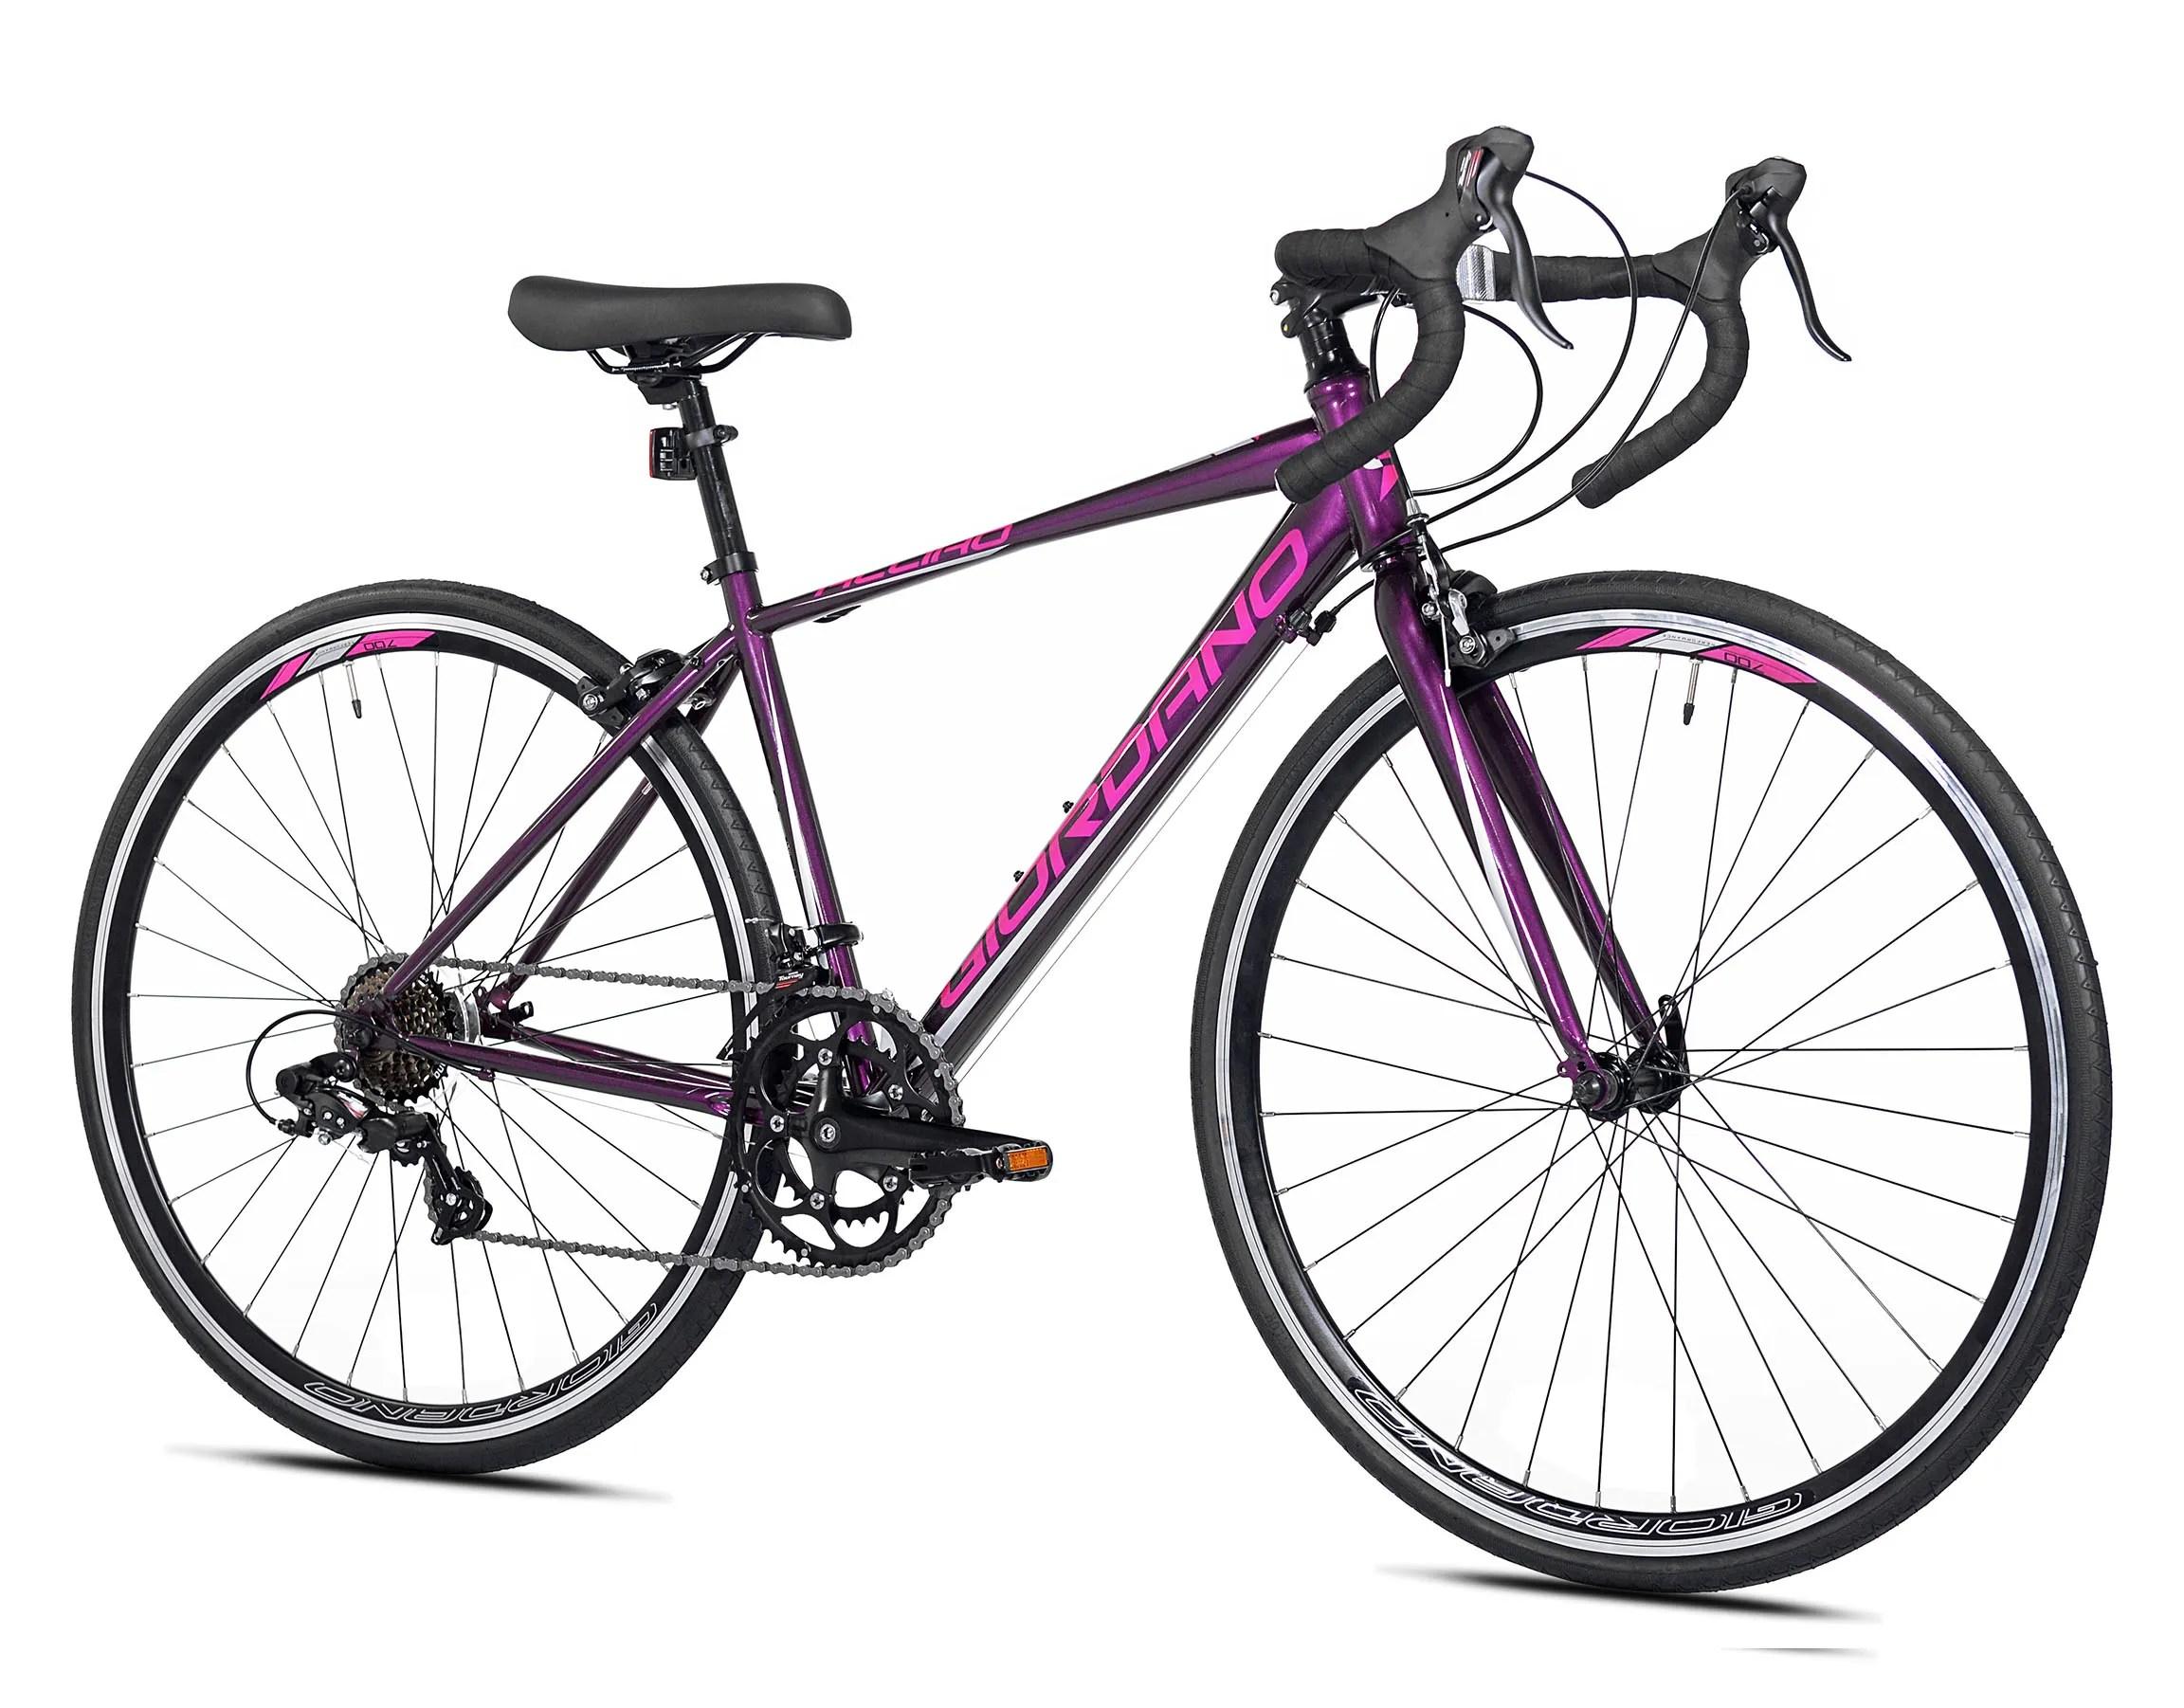 Giordano™ Road Bikes